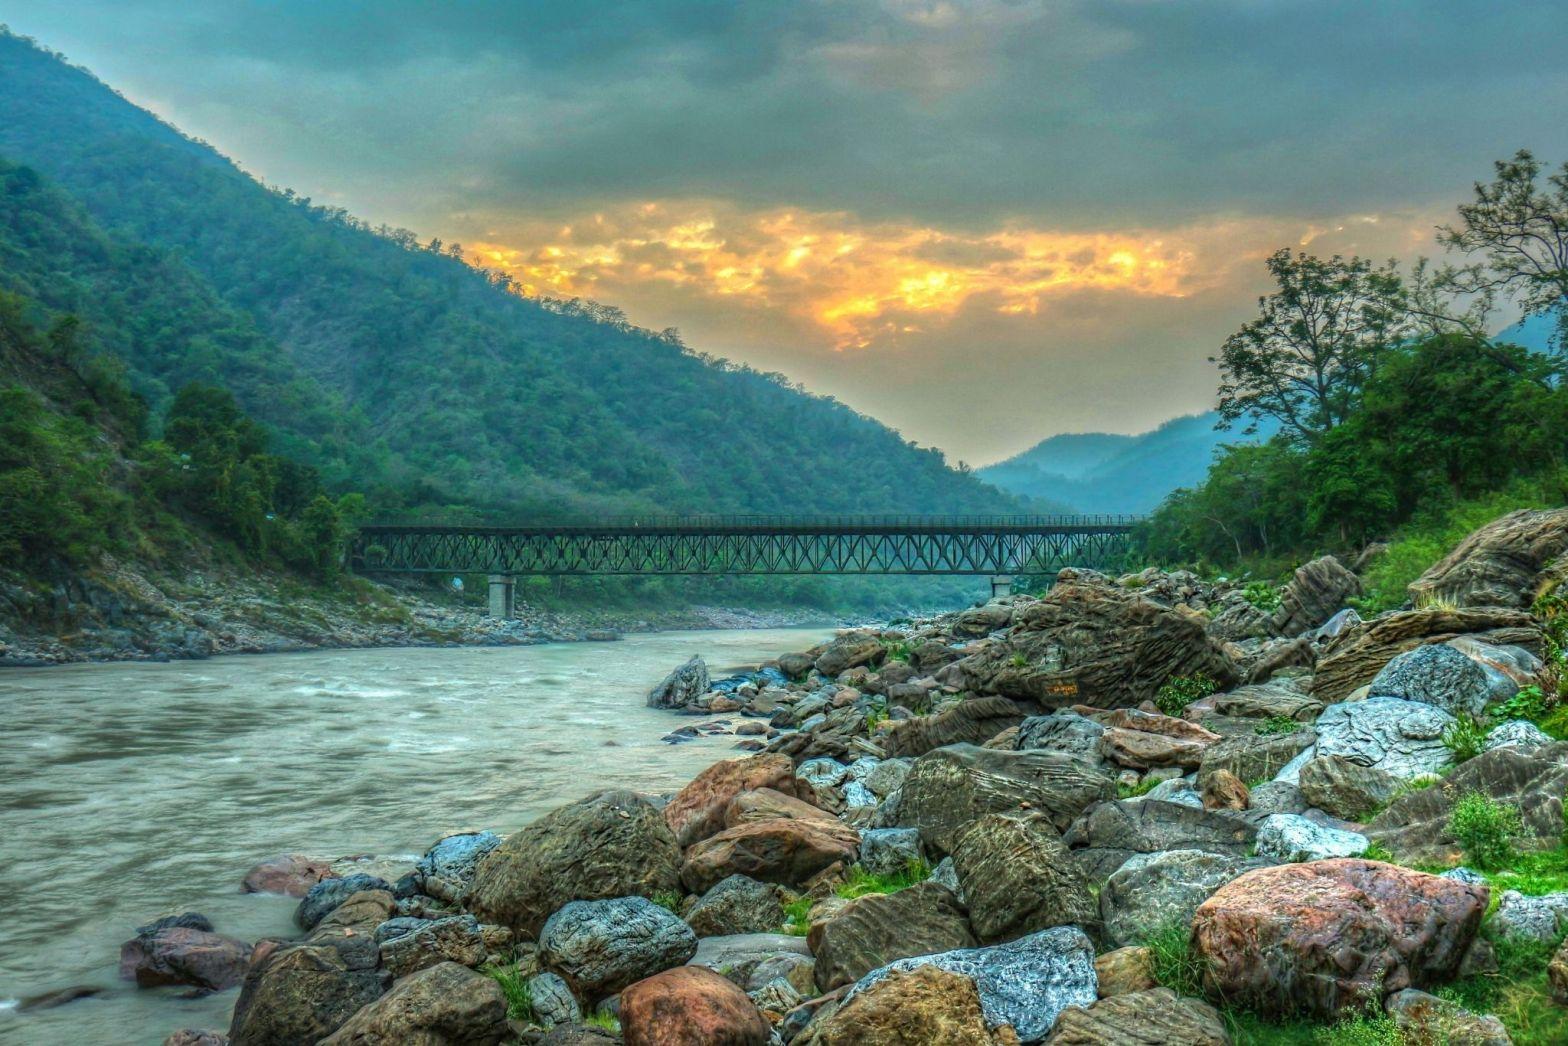 One Day Delhi to Haridwar & Rishikesh Trip by Car